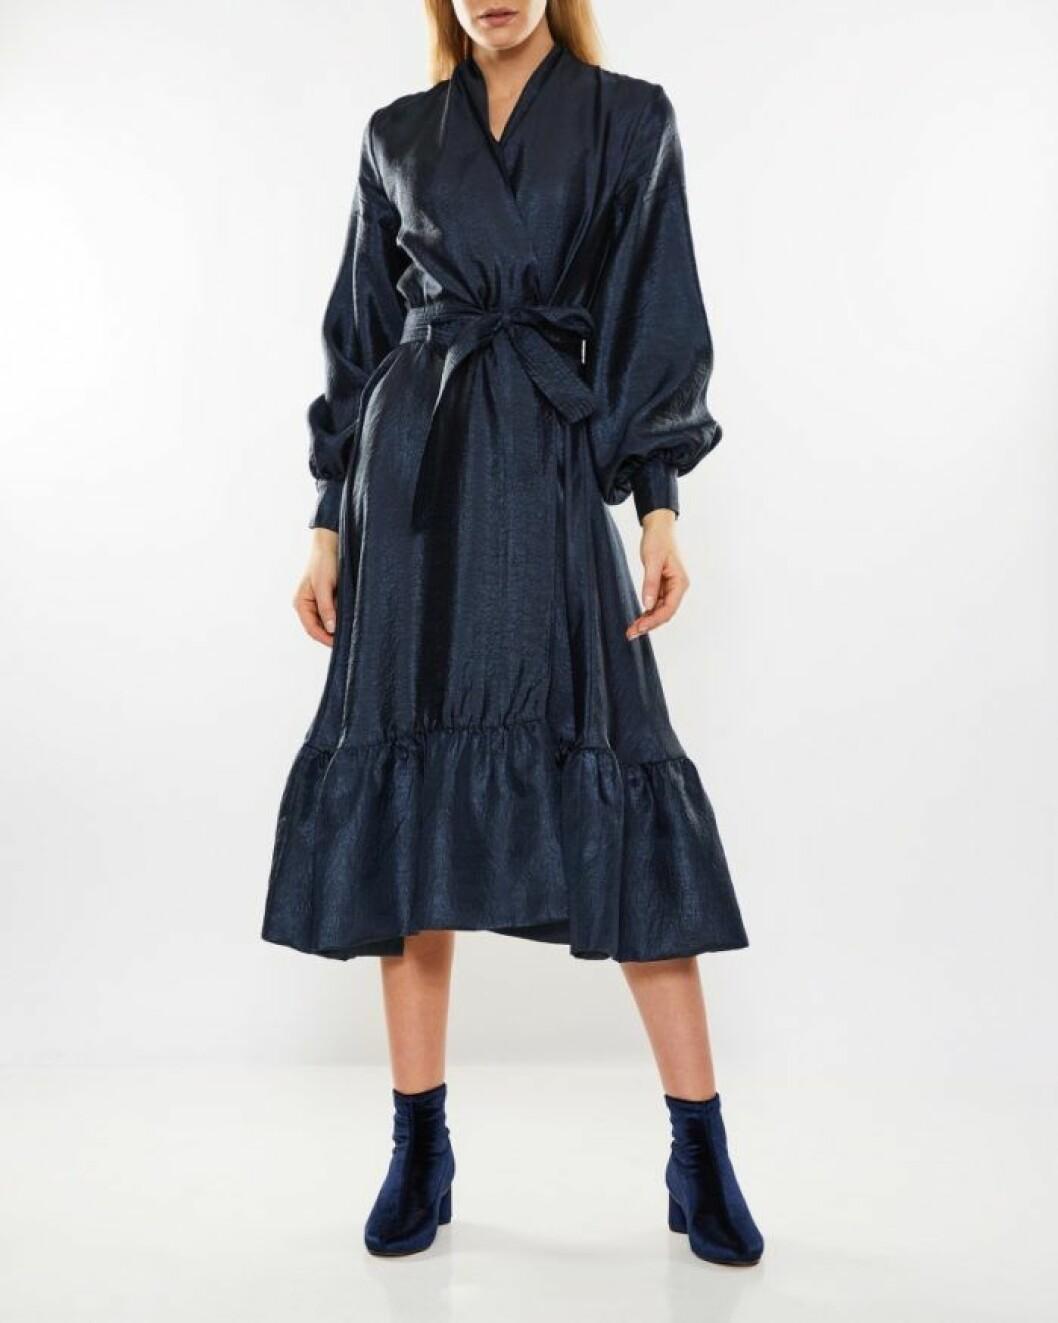 Midnattsblå Stine Goya-klänning